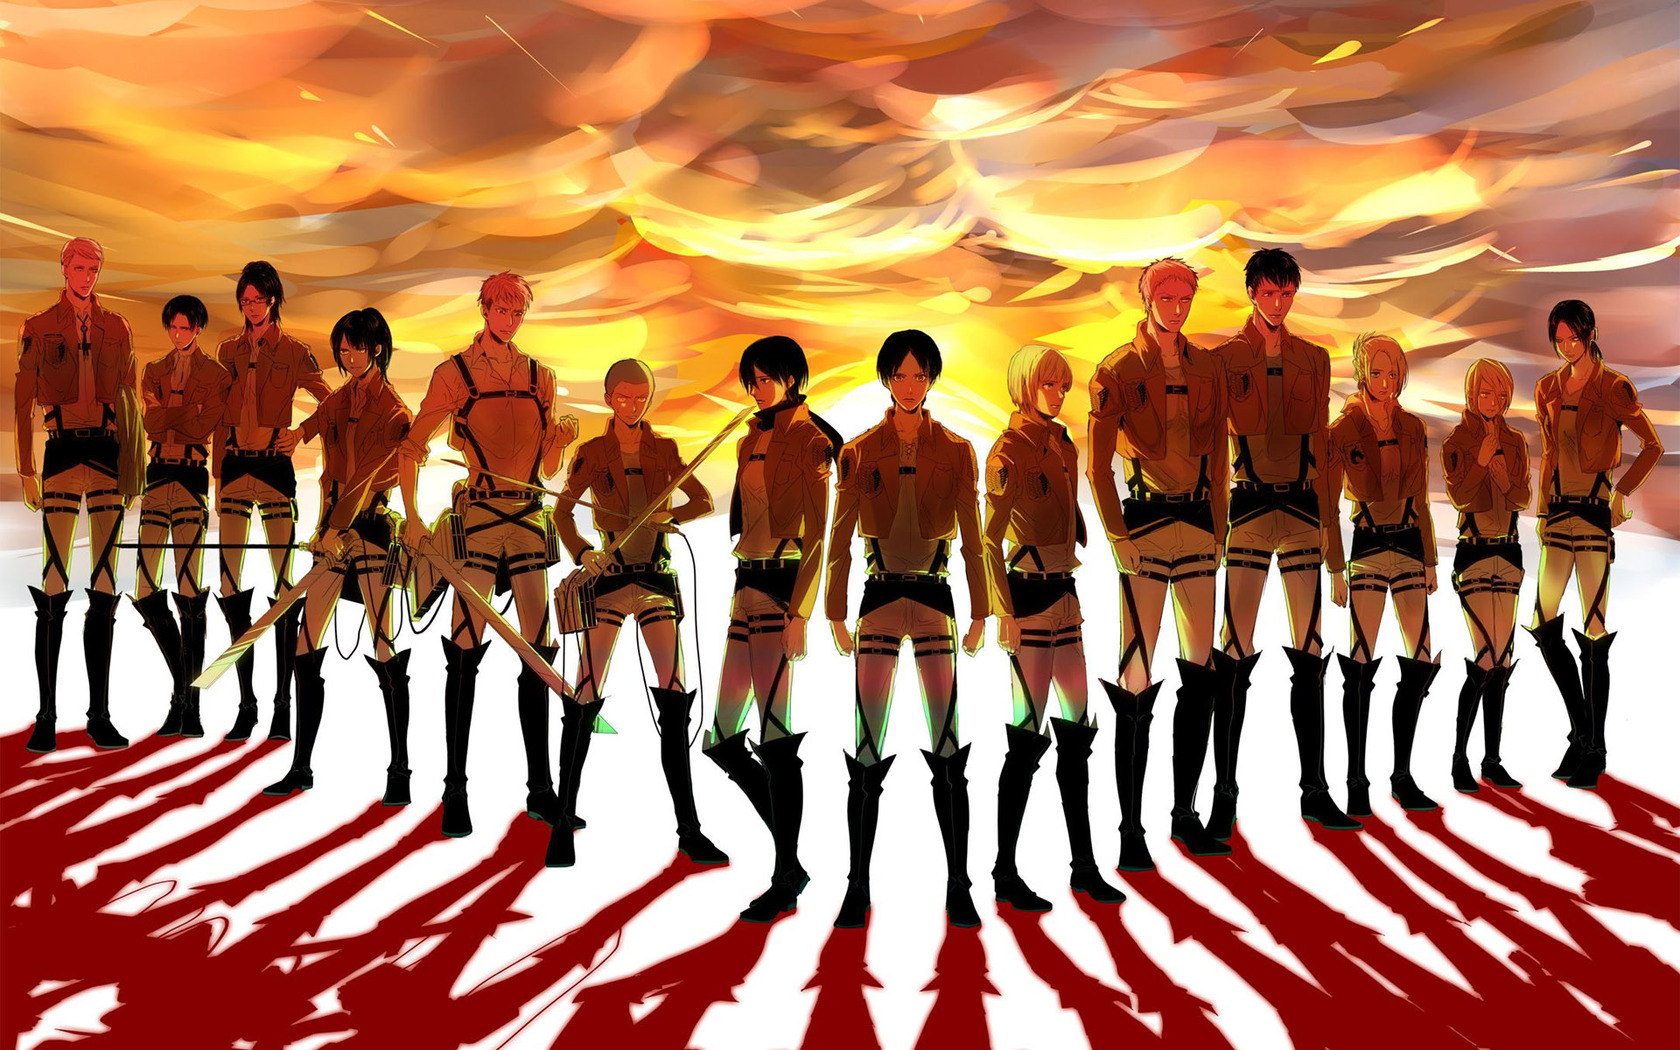 AOT 2 Attaque des Titans 2 blog gaming ciné série Lageekroom